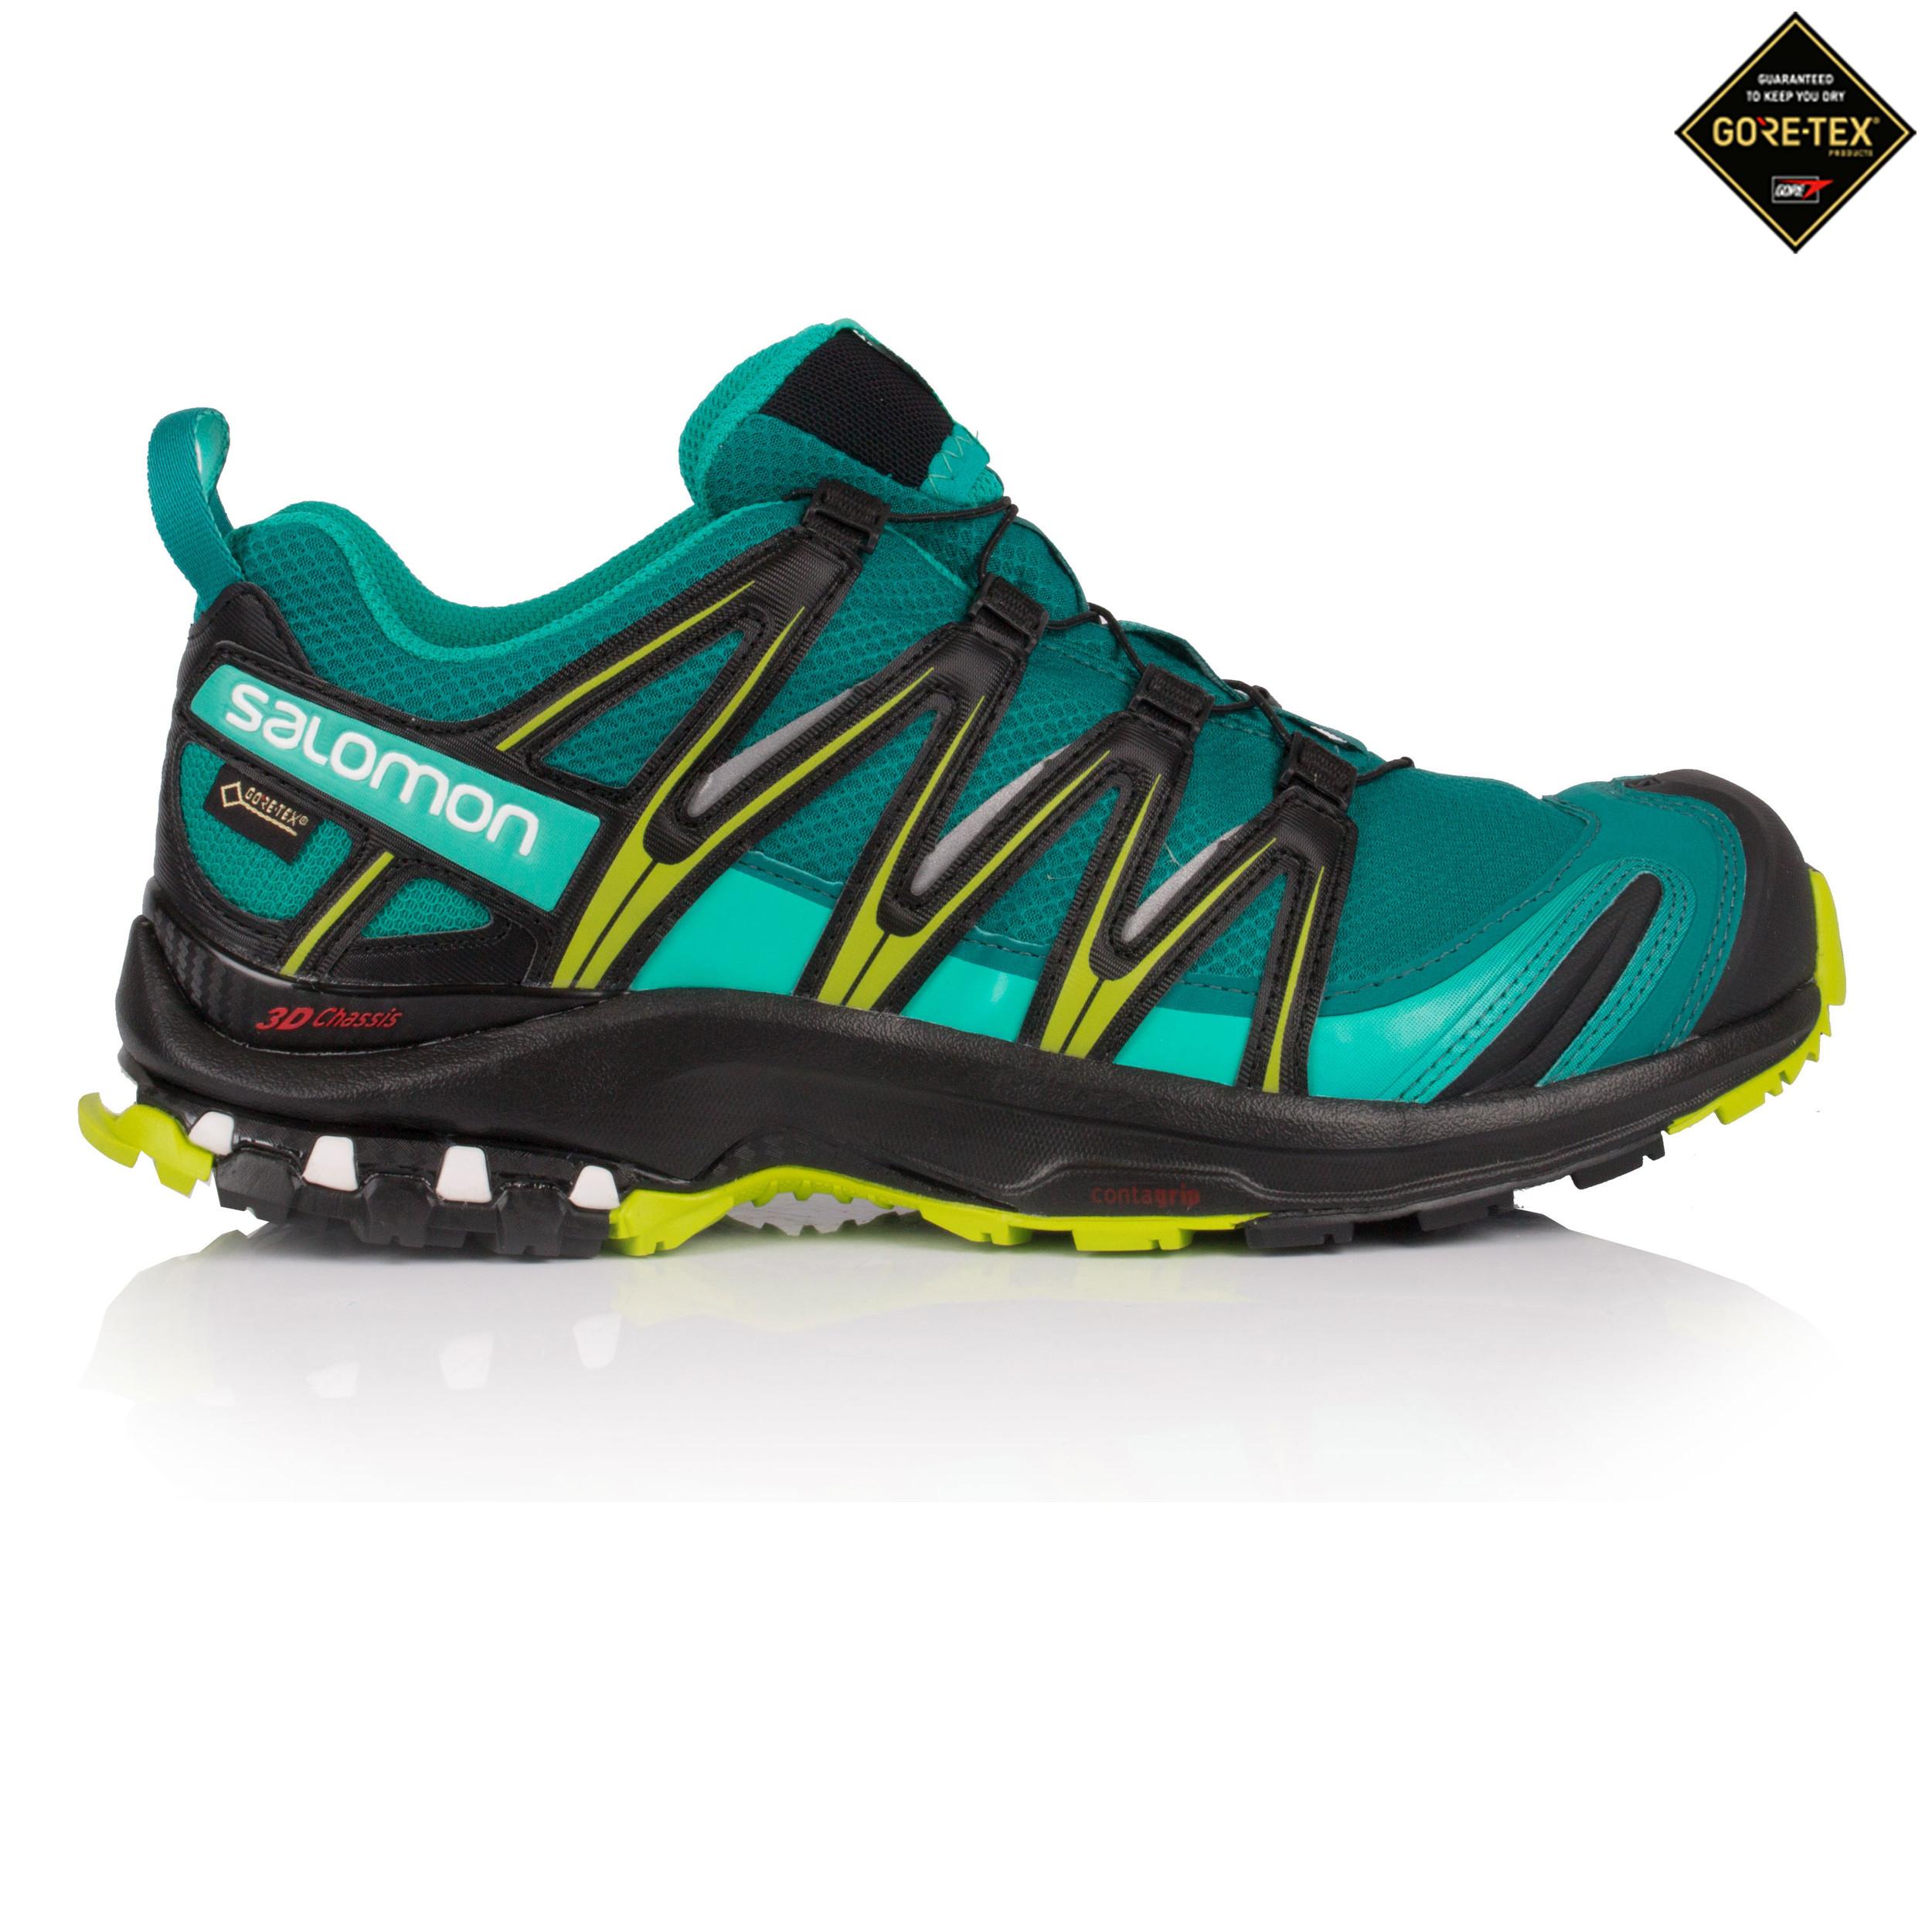 Salomon Damen XA PRO 3D GORE TEX Trail Gr n Jogging Sport Schuhe Laufschuhe